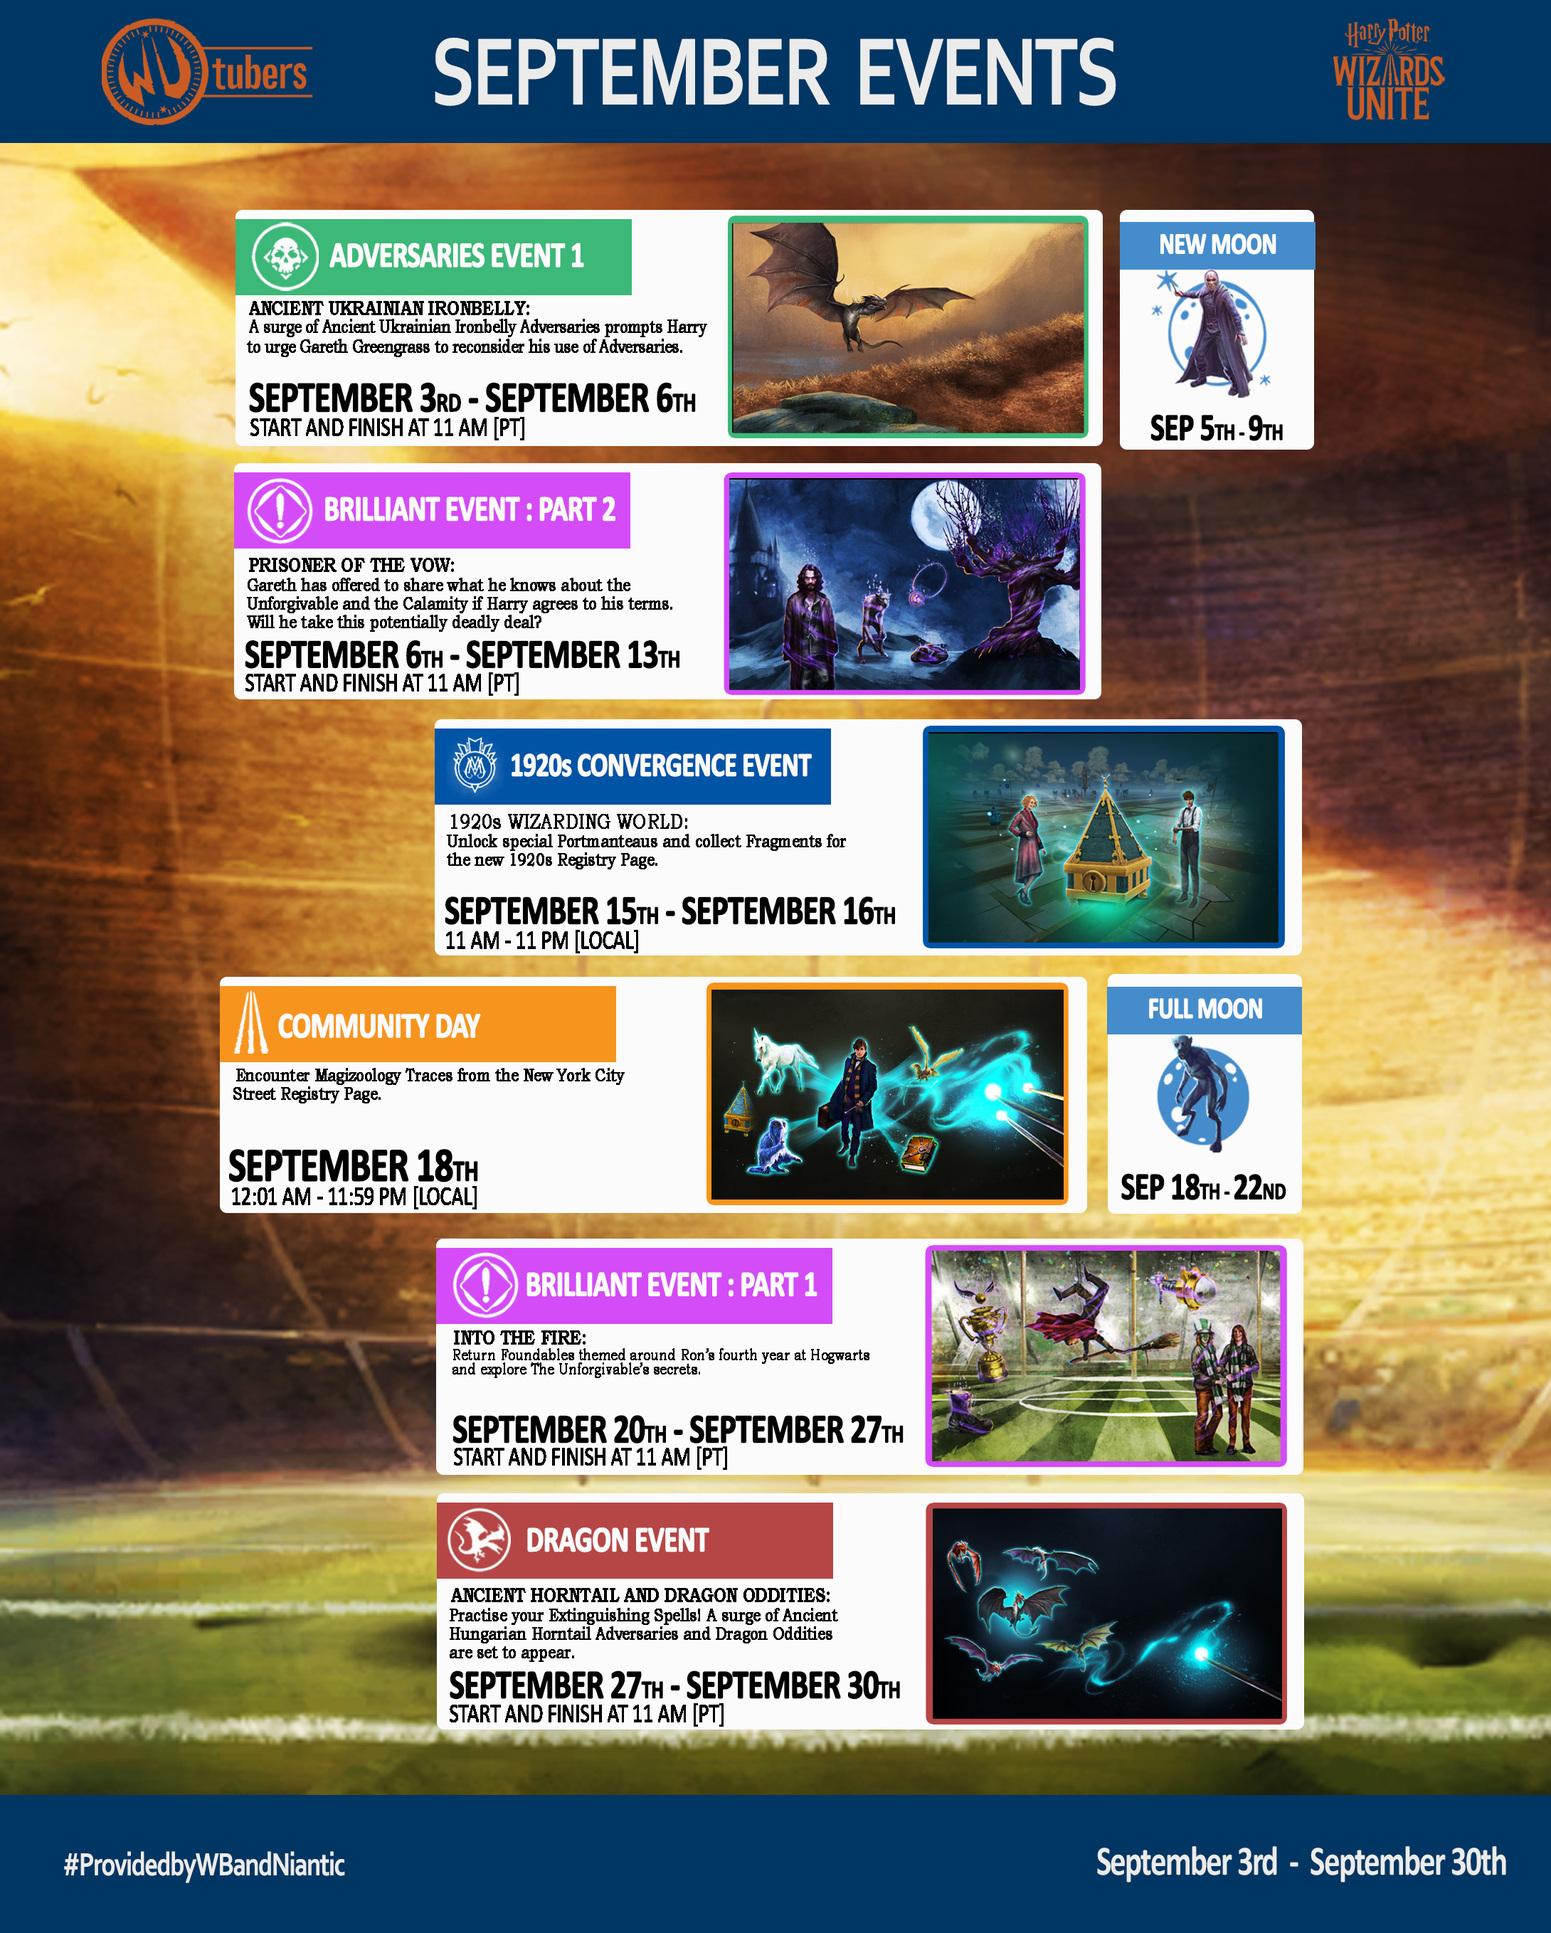 September_Events_Calendar.jpg